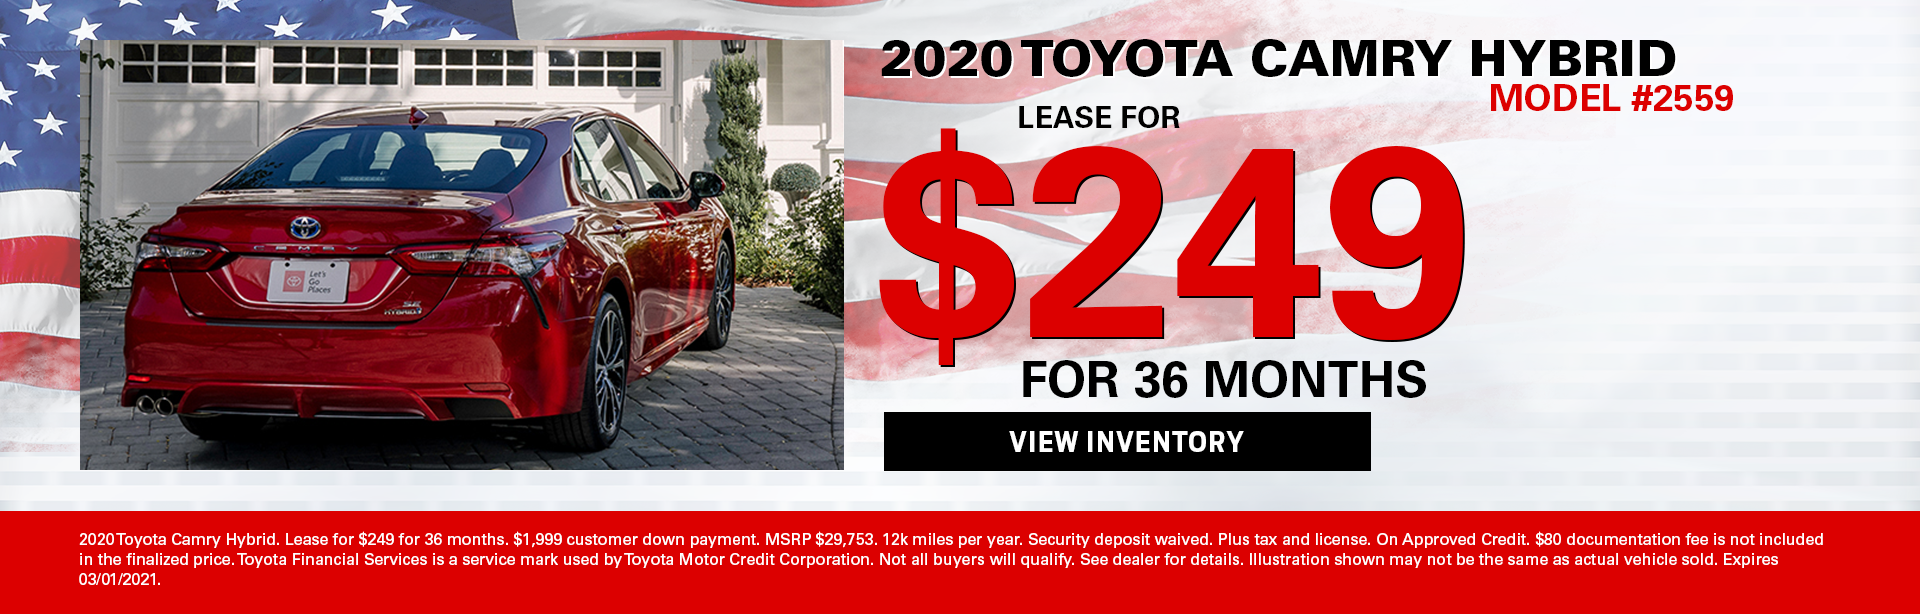 camryHybrid-lease